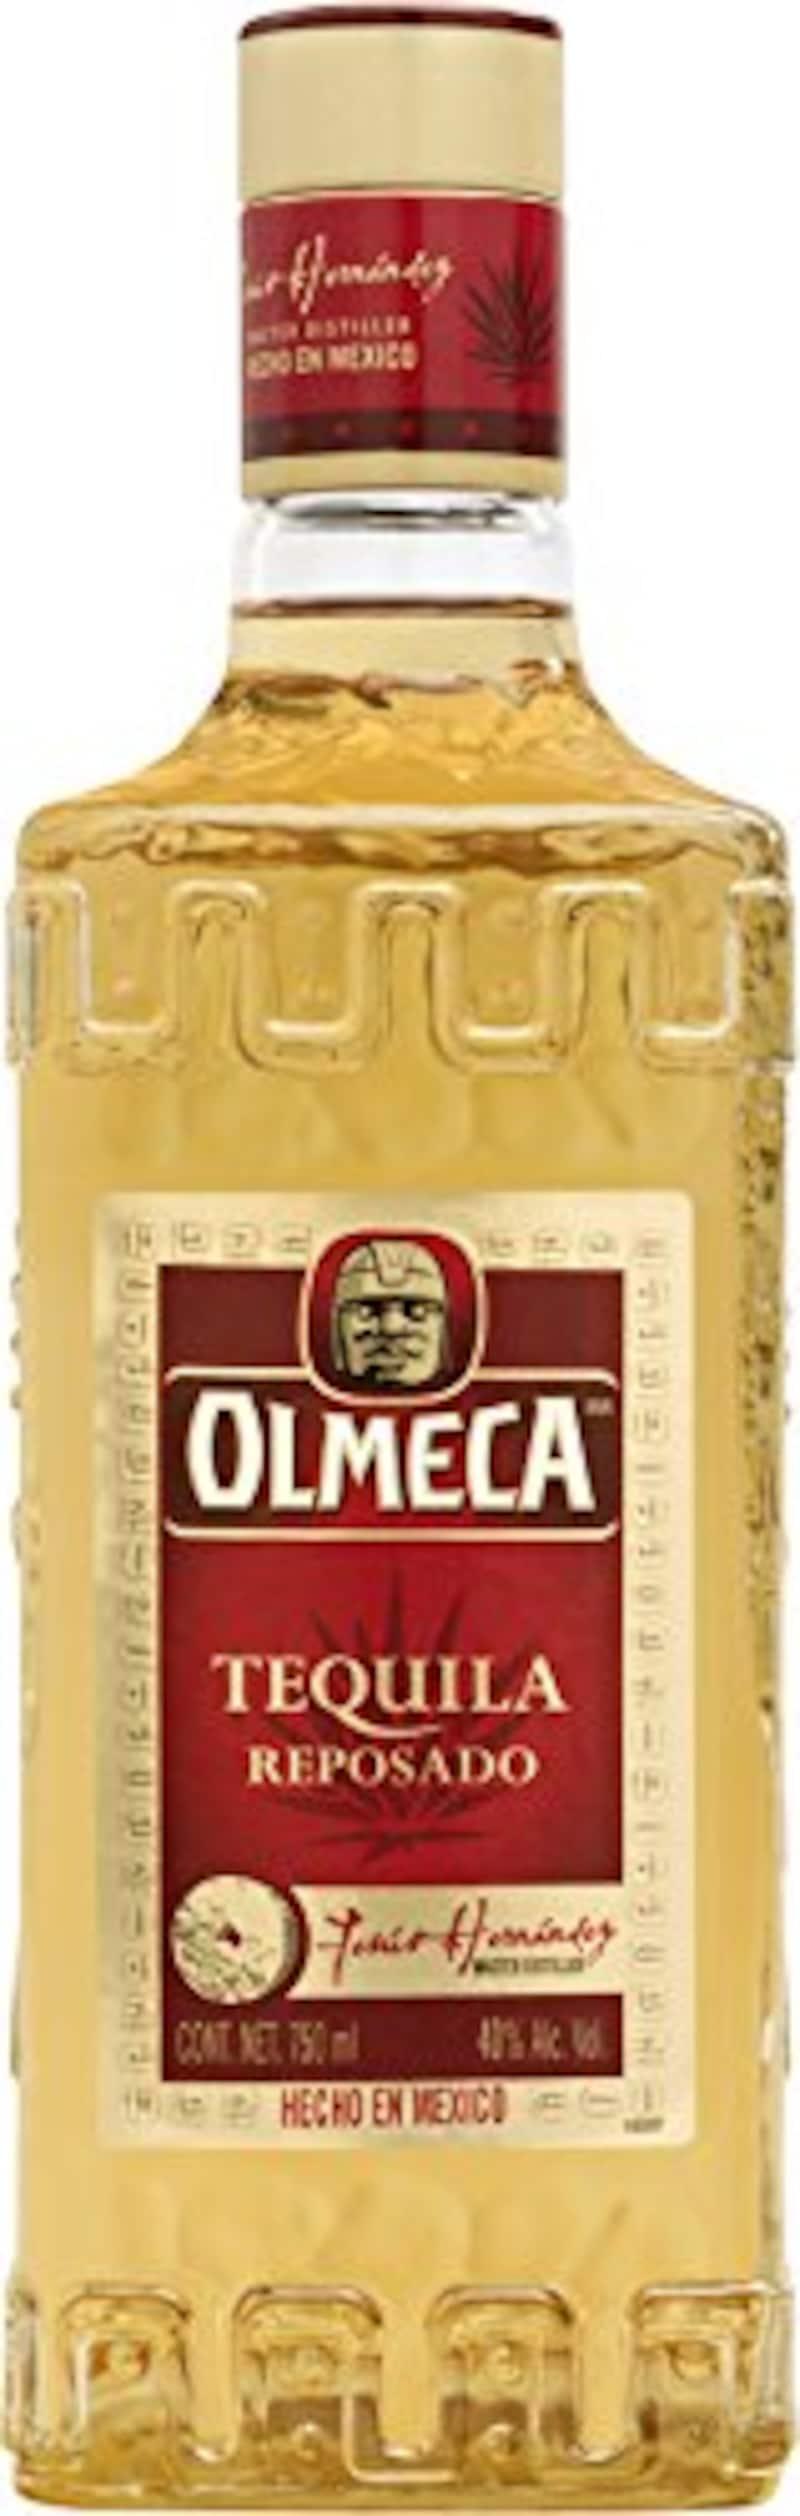 OLMECA (オルメカ),レポサド,-